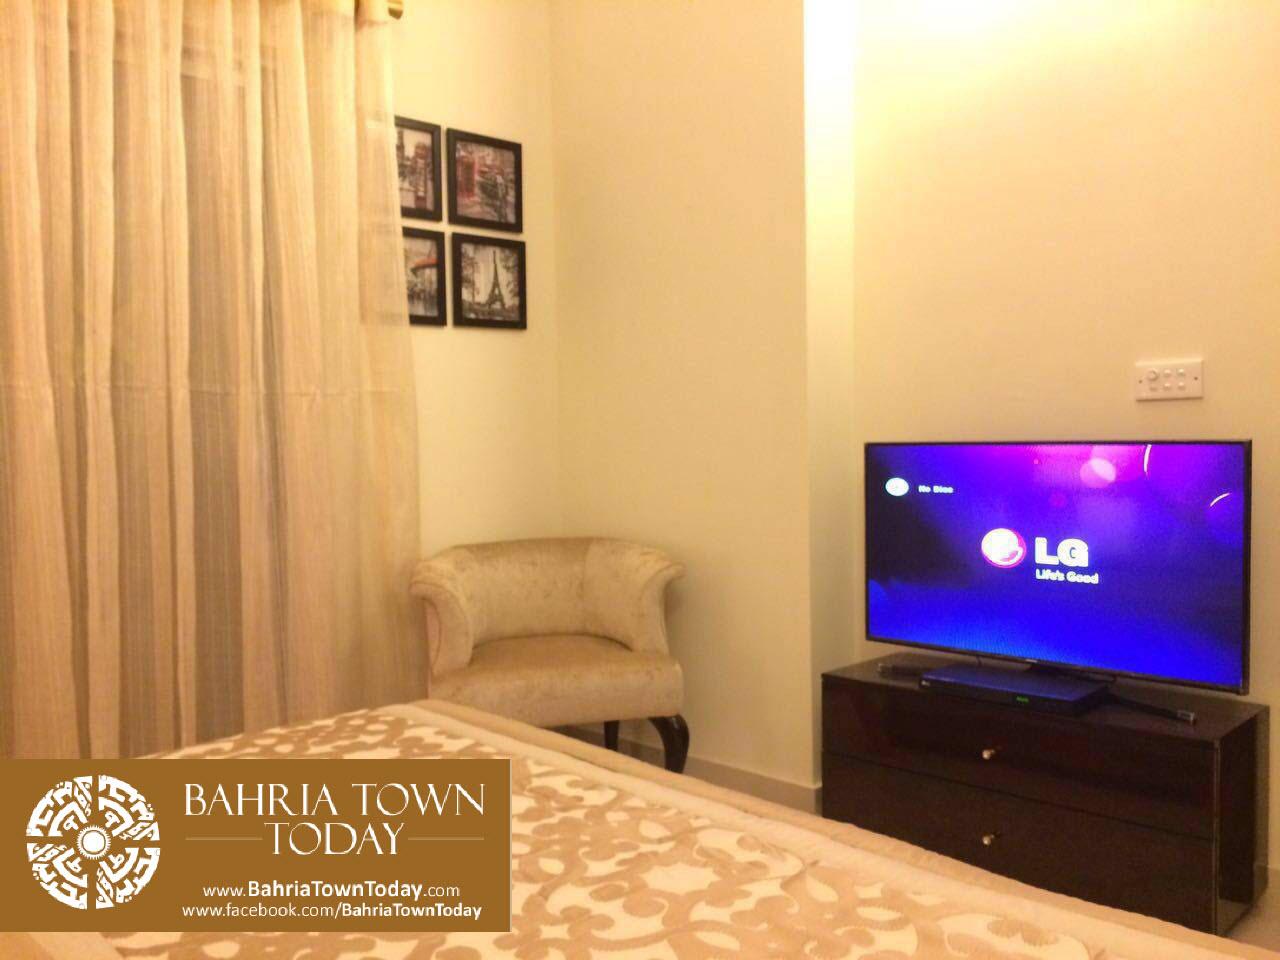 2 Bedroom Model Apartment – Bahria Town Karachi (3)